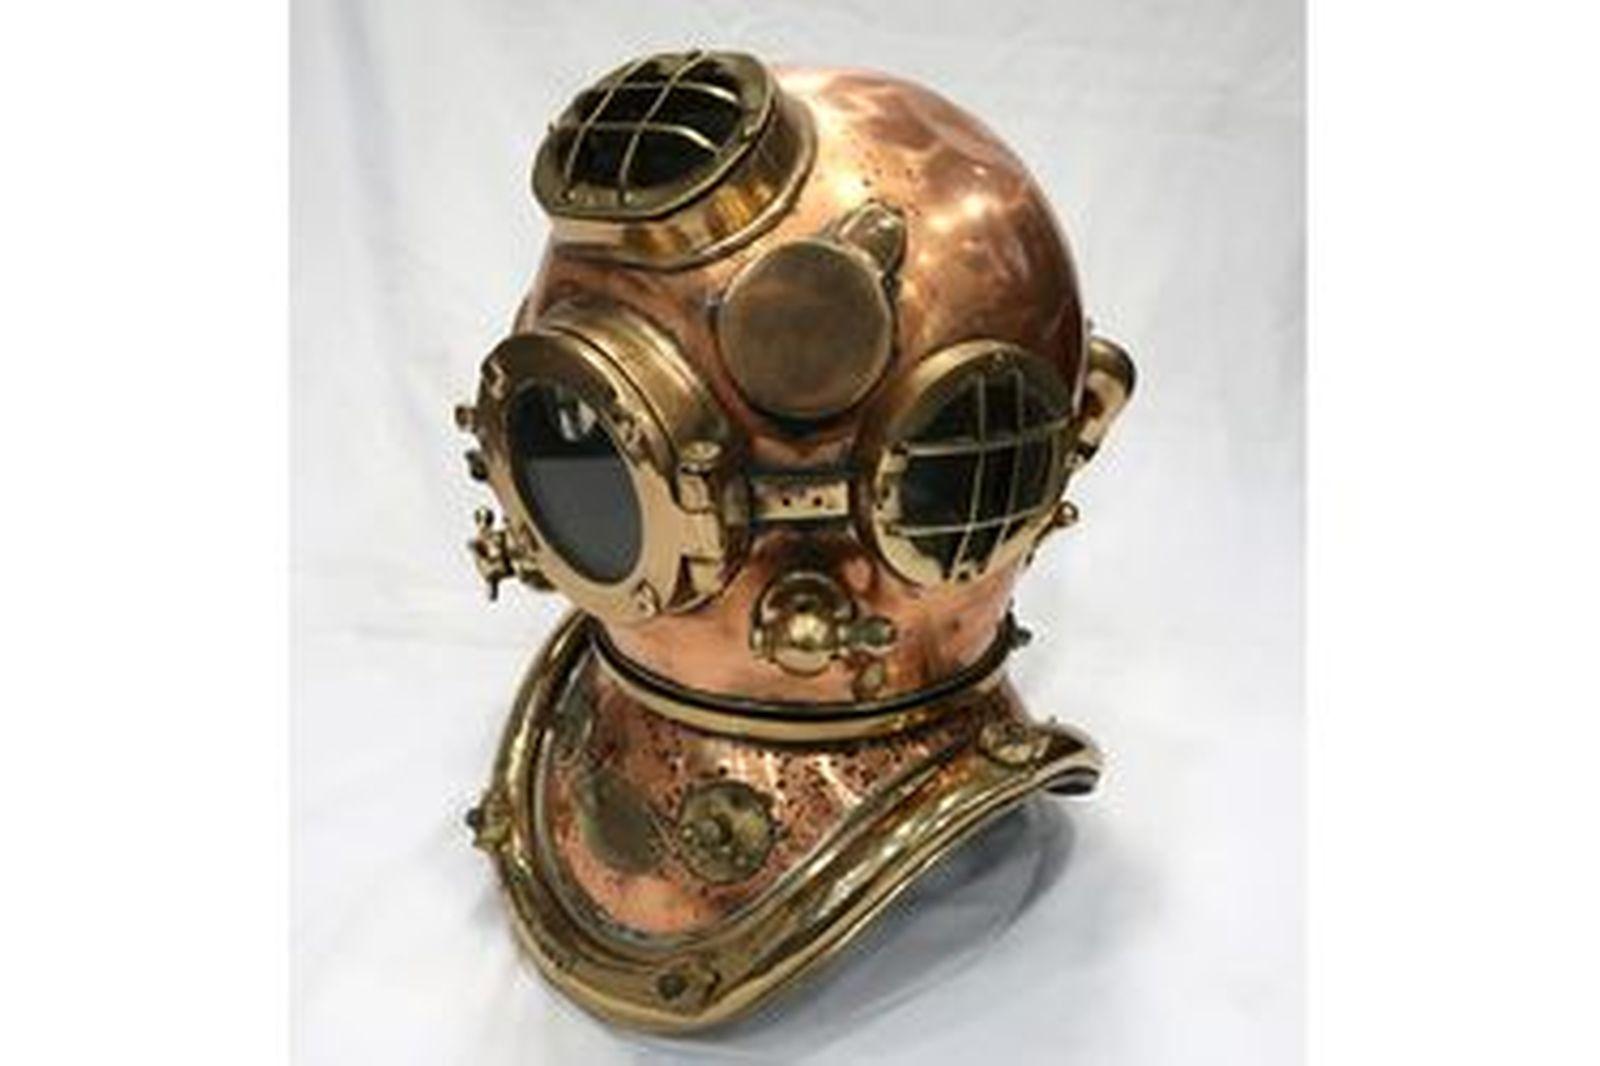 Marine Diver's Brass Helmet by Siebe Gorman & Co Limited Submarine Engineers London